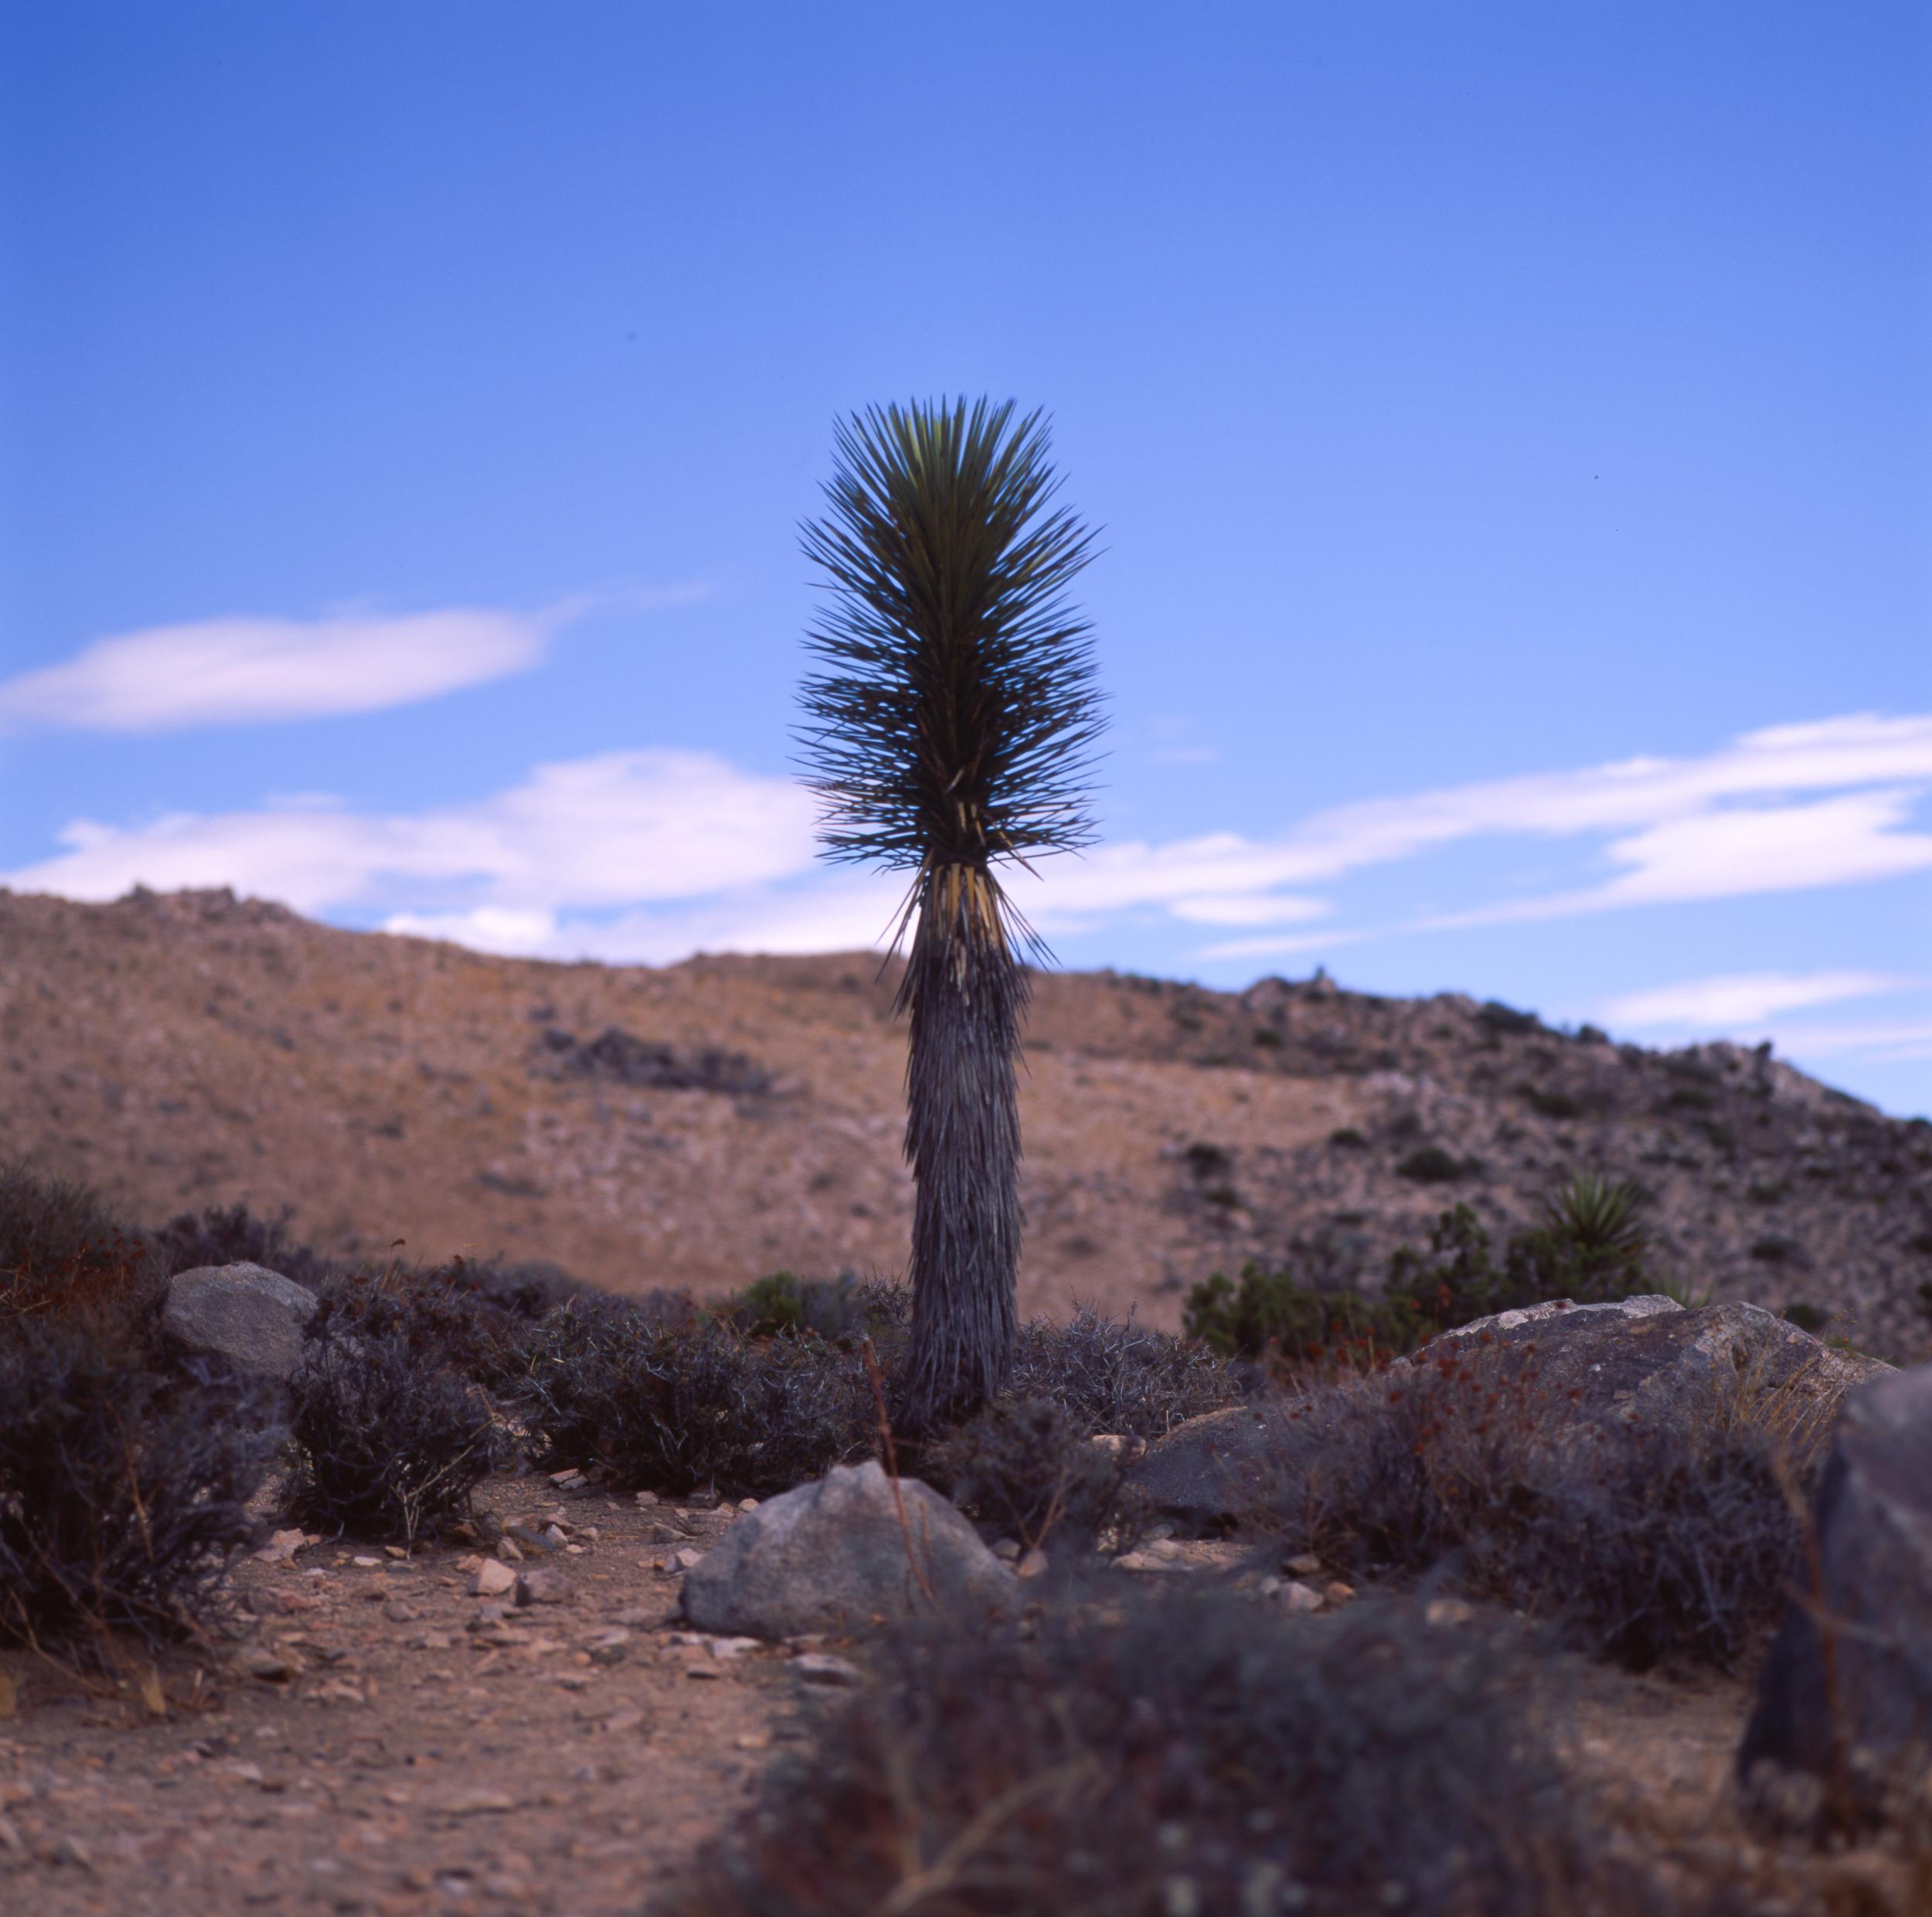 Joshua Tree Hasselblad 501cm | Fuji Velvia 50